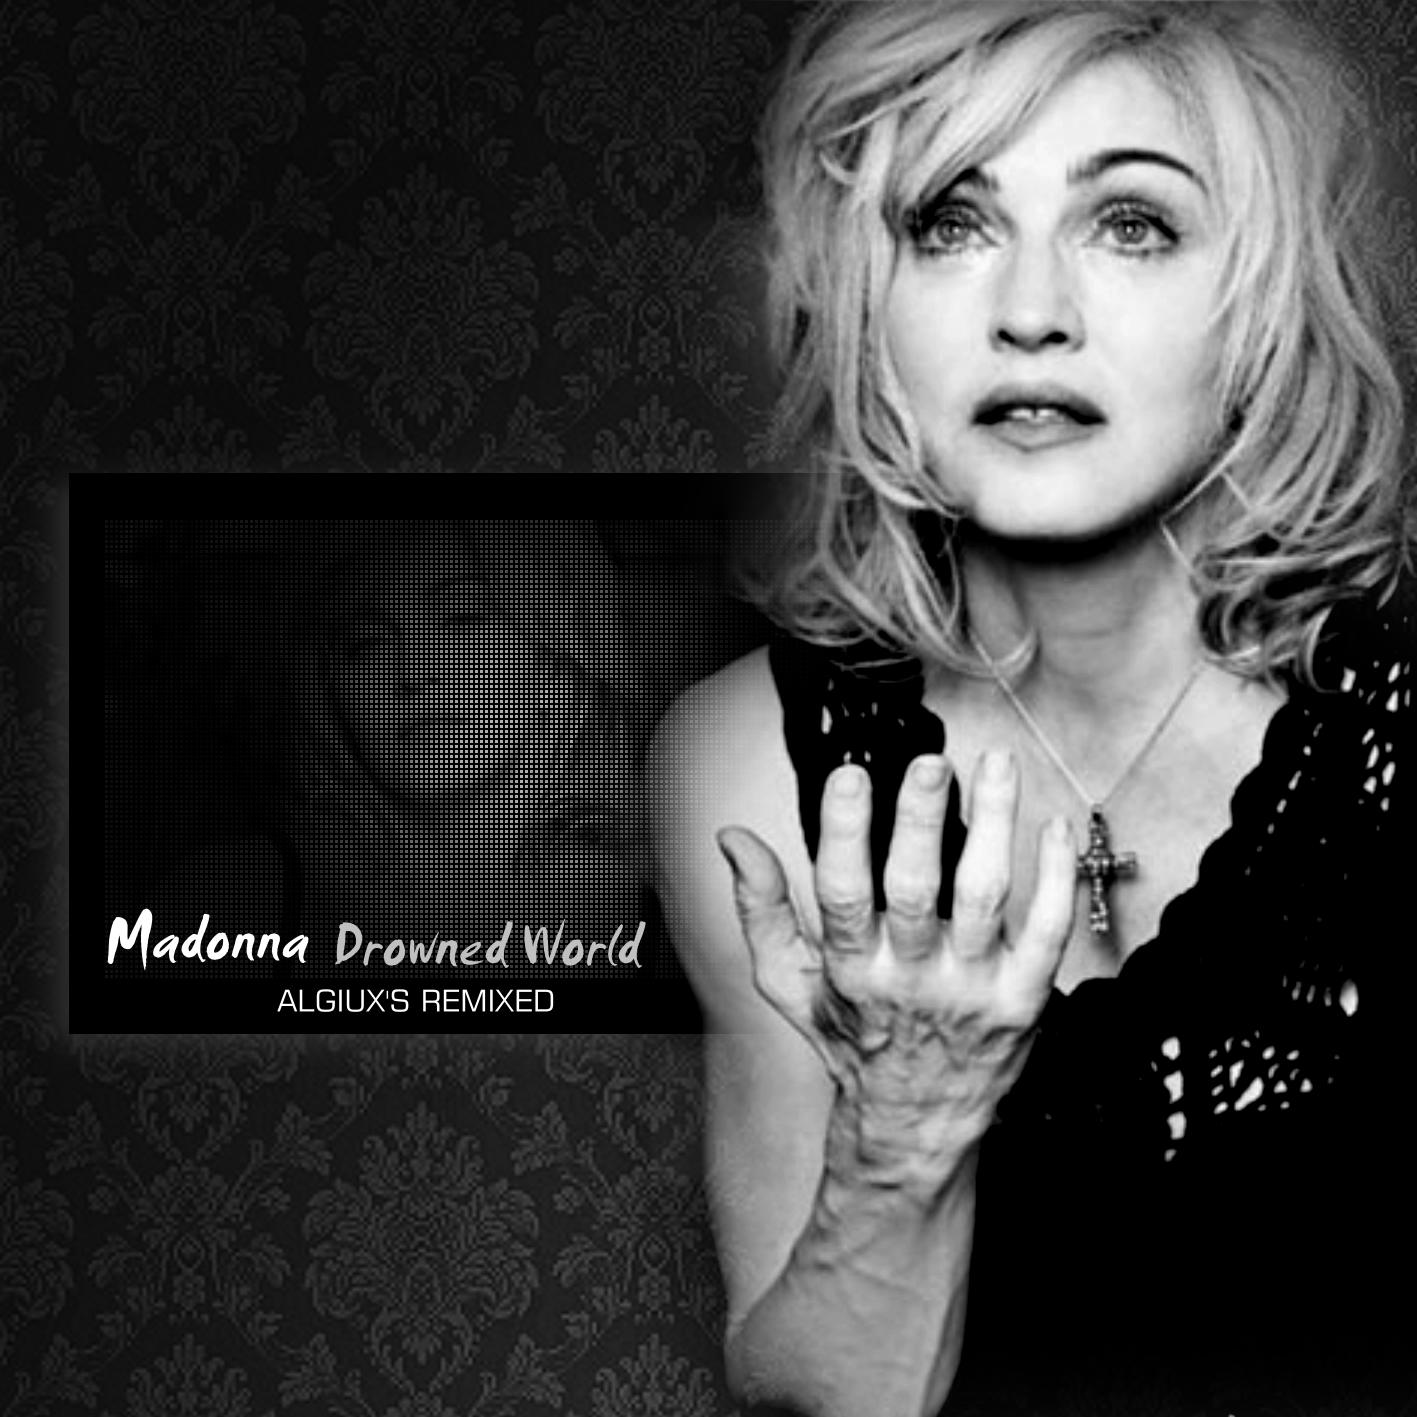 http://3.bp.blogspot.com/-5WiCTC57KQ4/ThI8iNyqP3I/AAAAAAAAEag/3MB4Uv6PNjw/s1600/Madonna-Drowned%2BWorld.JPG